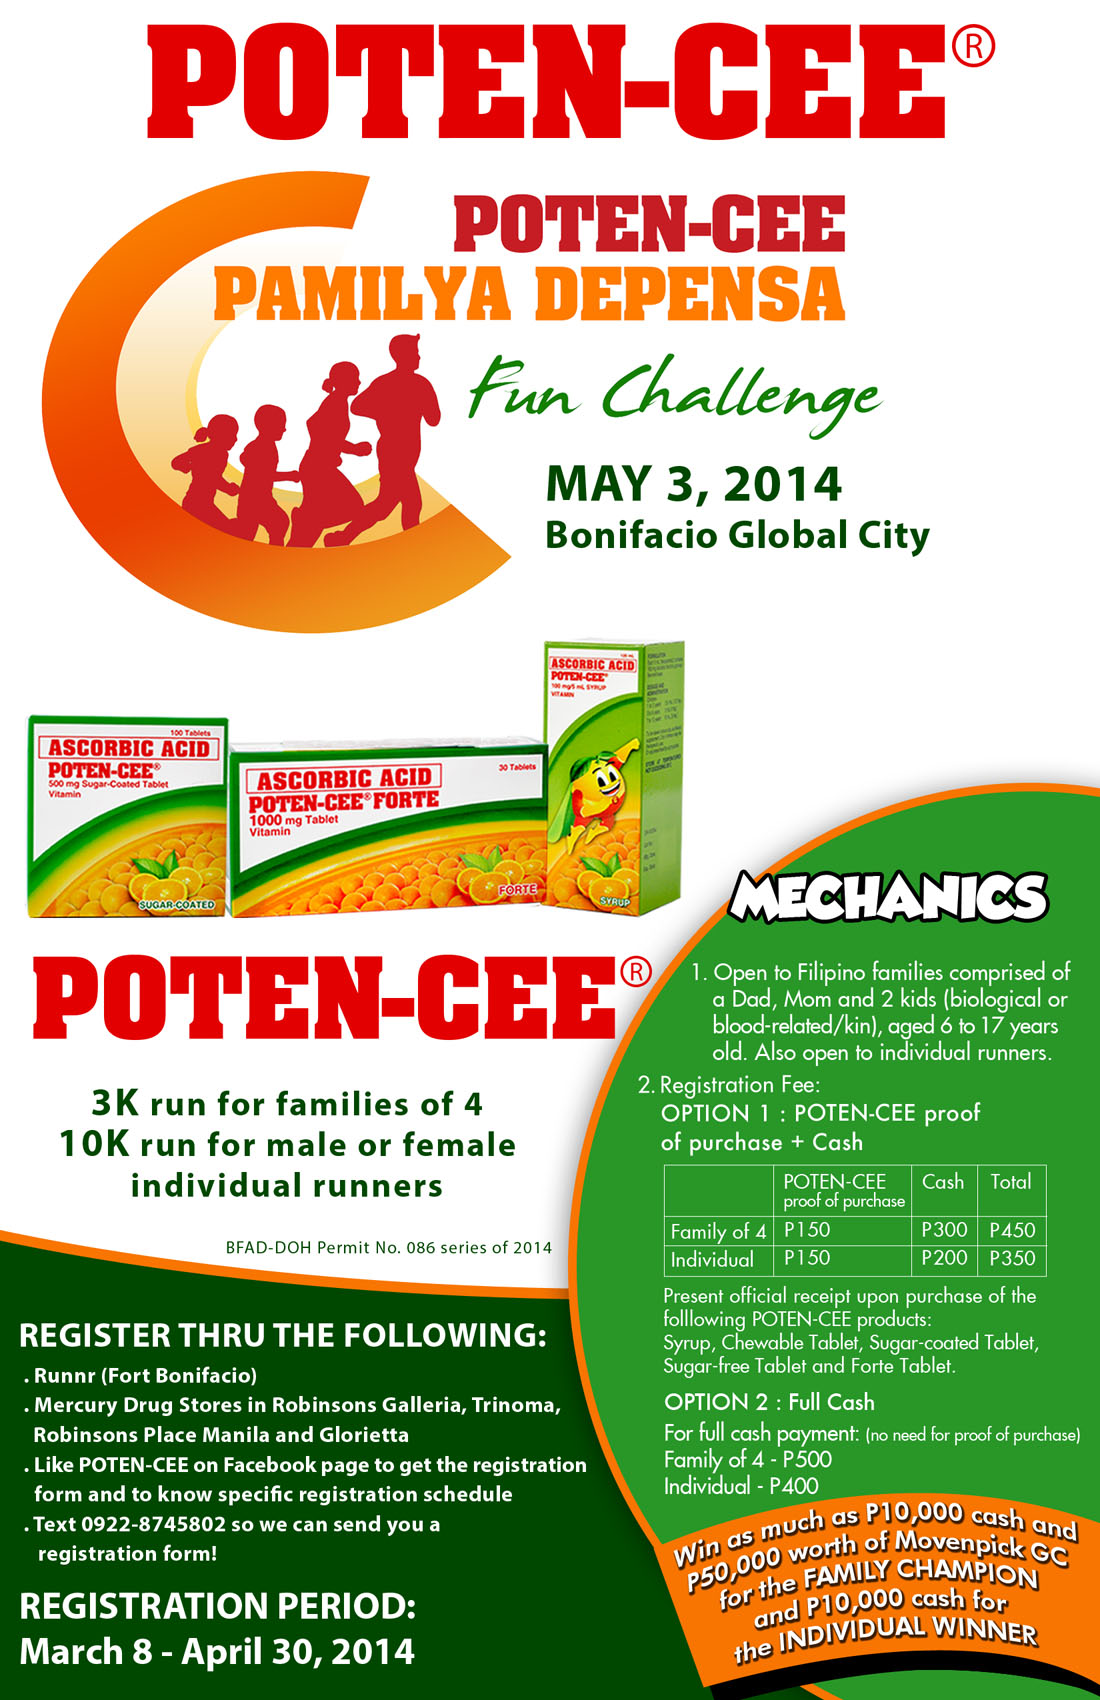 poten-cee-pamilya-depensa-fun-challenge-2014-poster